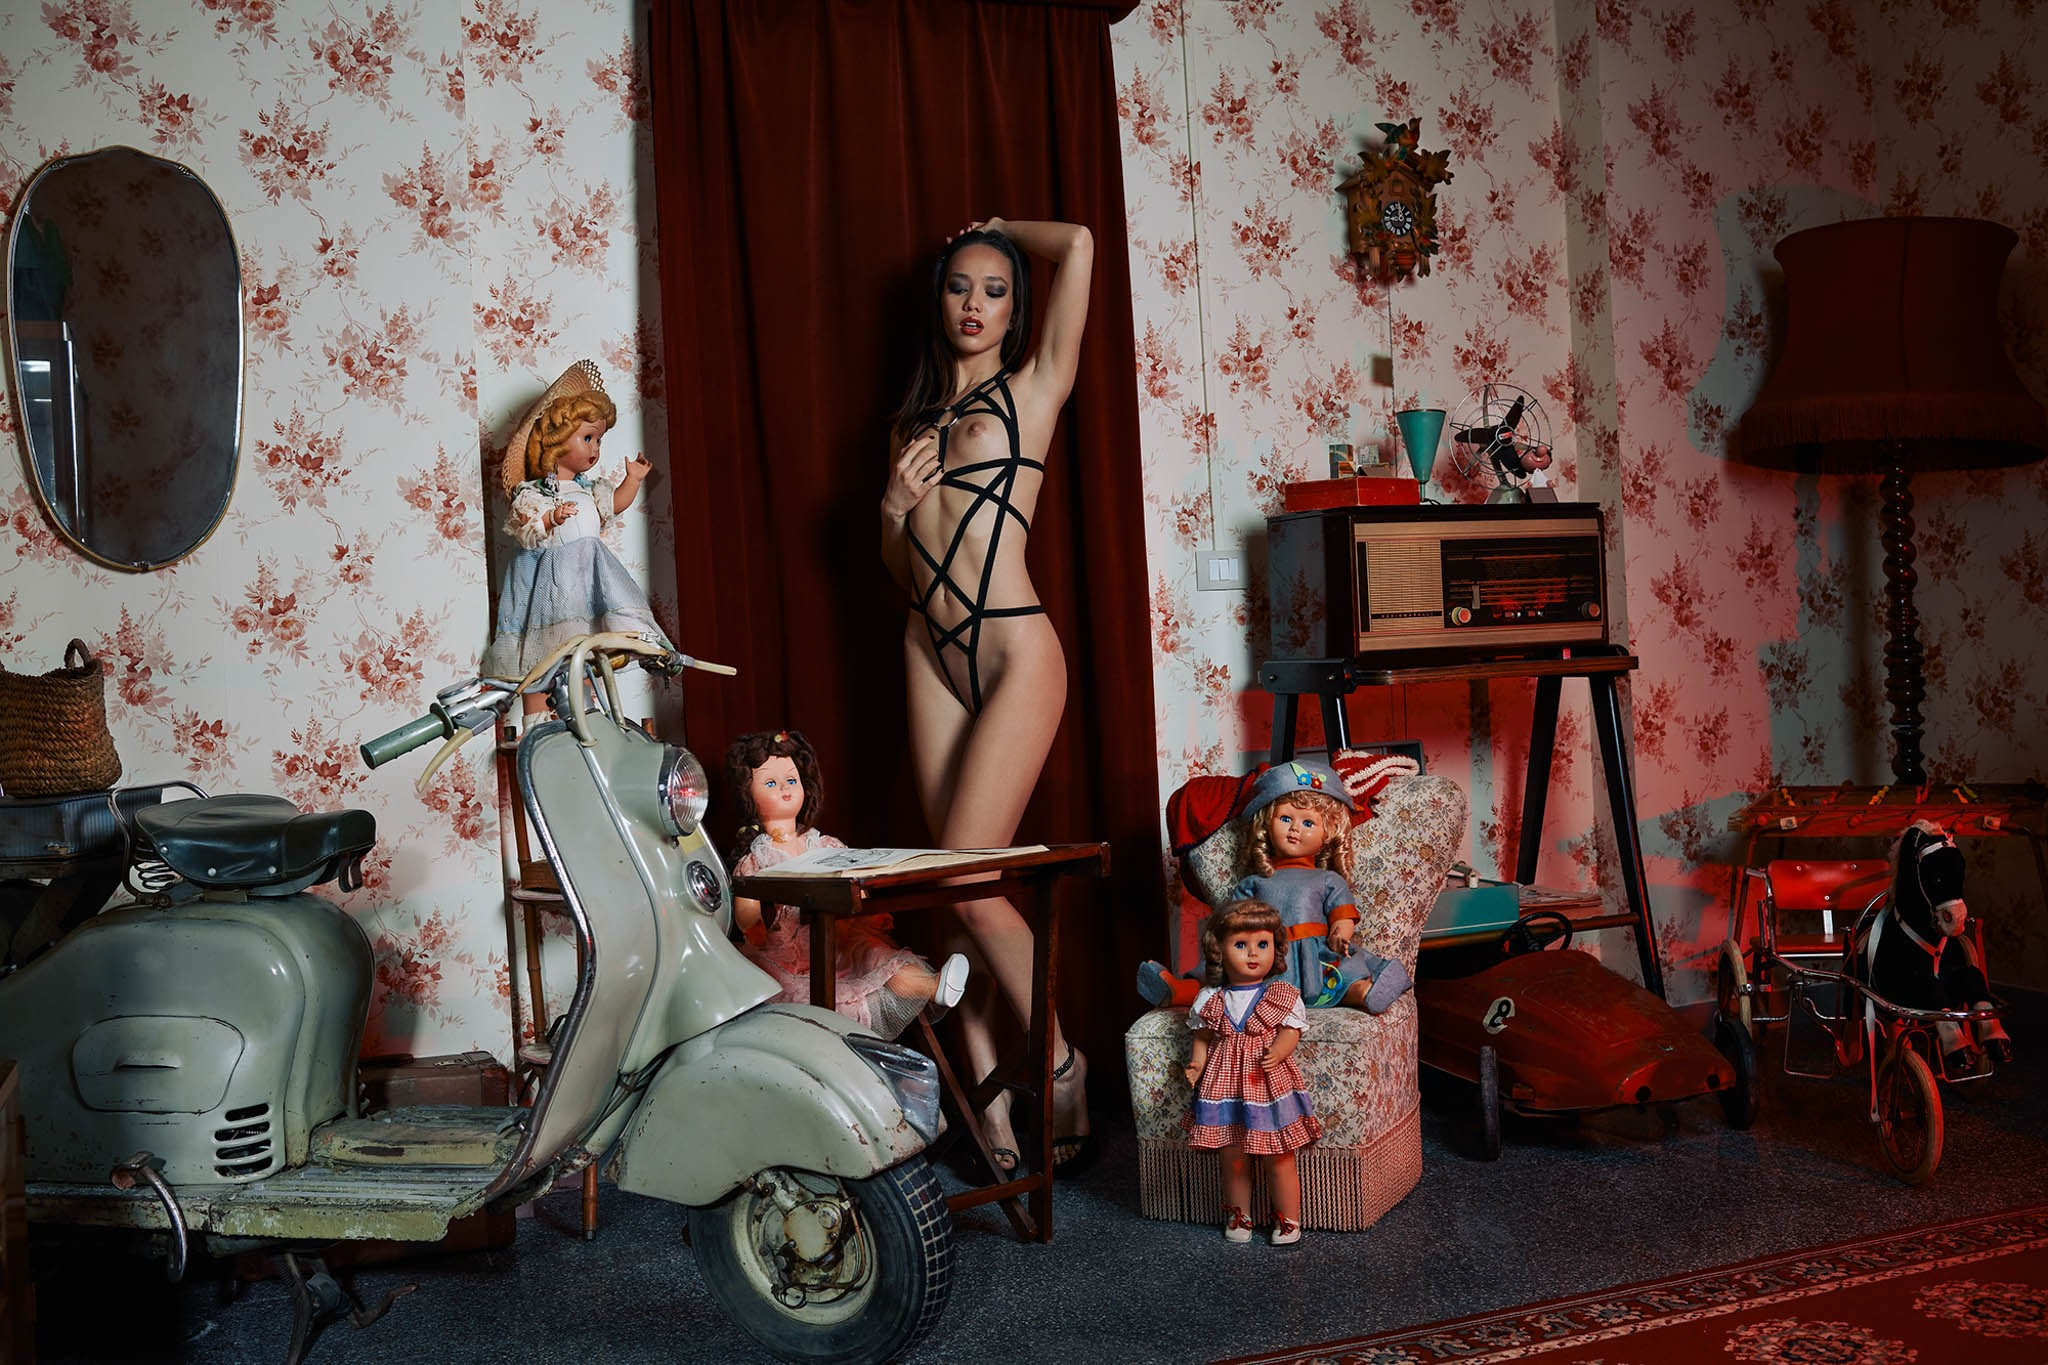 взрослые игры с детскими игрушками / Kitrysha nude by Gianluca Bonanno - The Forest Magazine